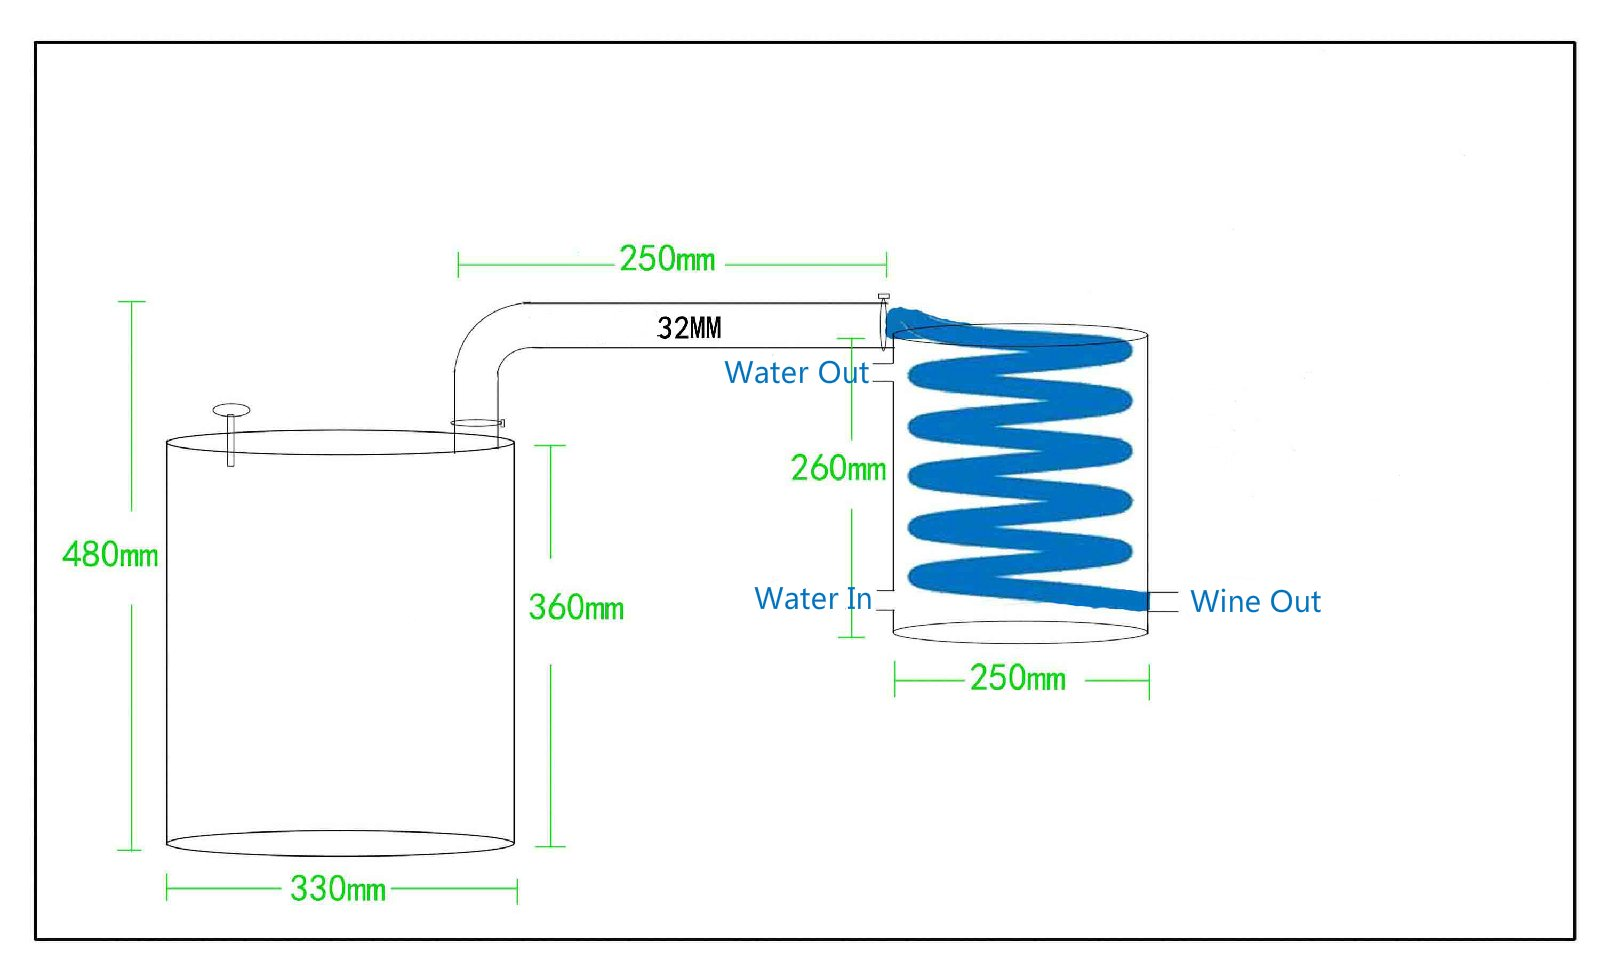 20-70 Litre DIY Alcohol Whiskey Water Distiller Copper Home Brew Kit Wine Making Equipment Moonshine Still